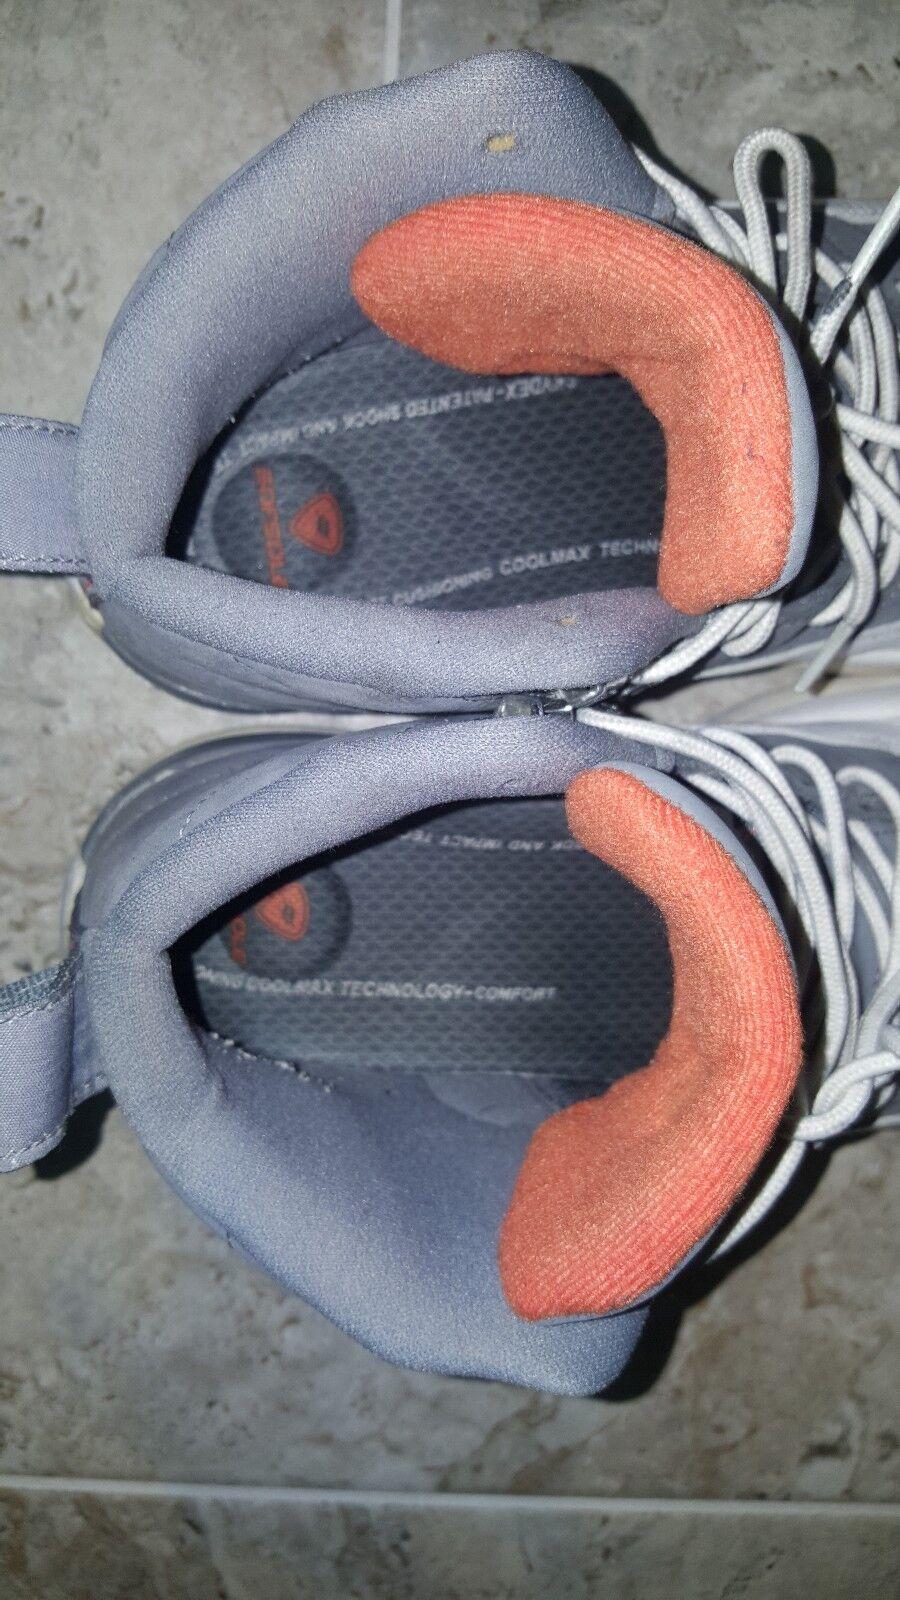 nike retro air jordan xii 12 retro nike - cool, grau / weiß / orange 130690-012 größe us11 jahrgang 0a7a98